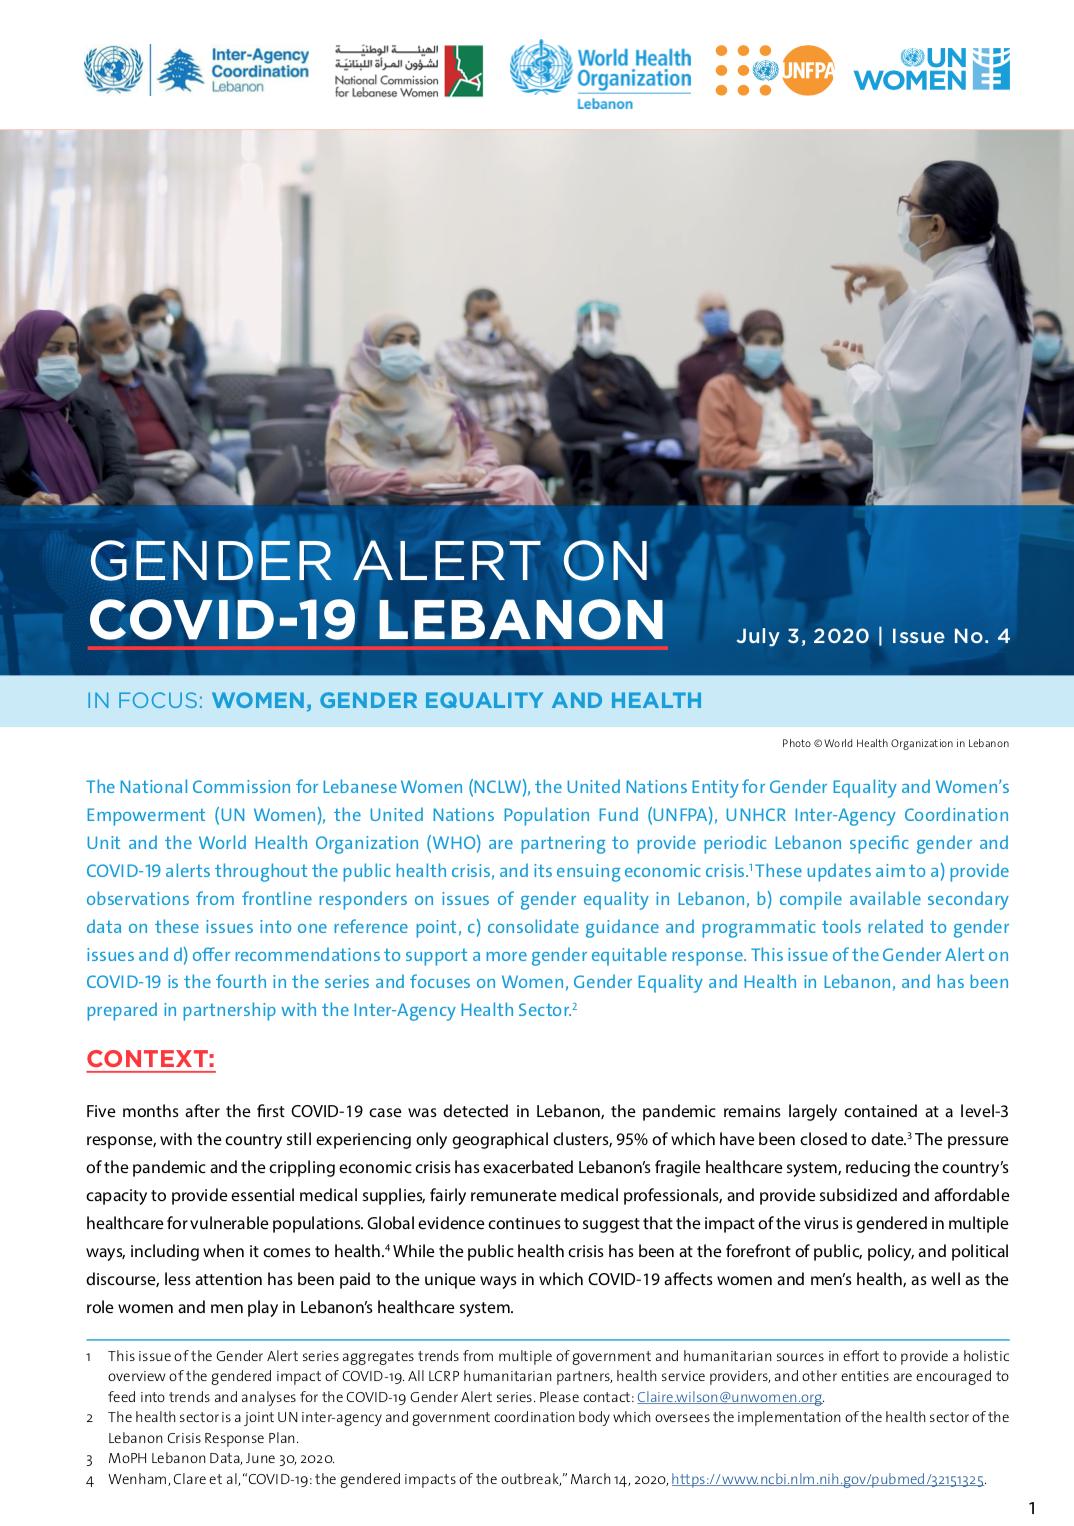 Gender Alert 4 on COVID-19 in Lebanon